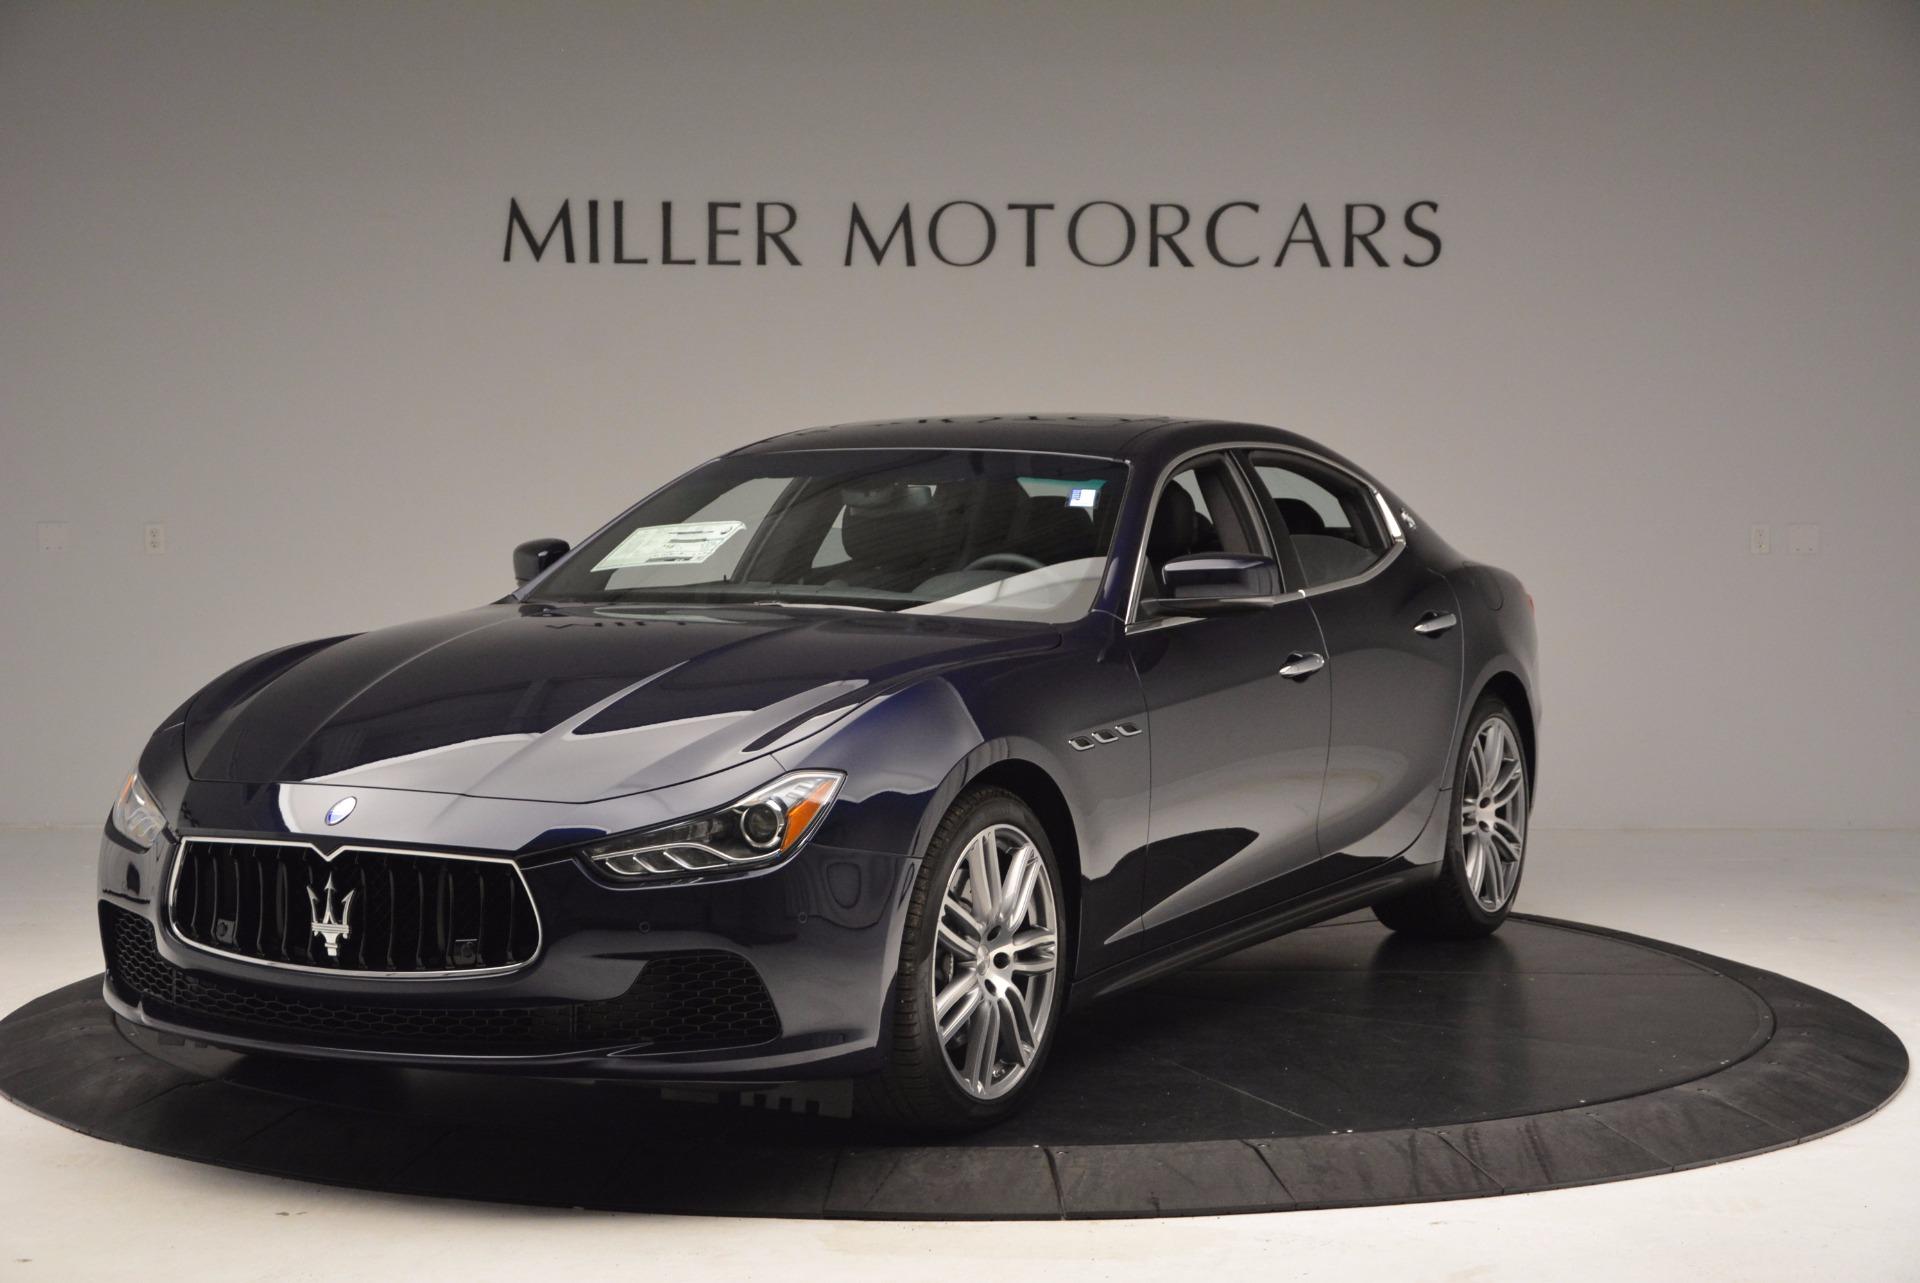 New 2017 Maserati Ghibli S Q4 For Sale In Greenwich, CT 1041_main